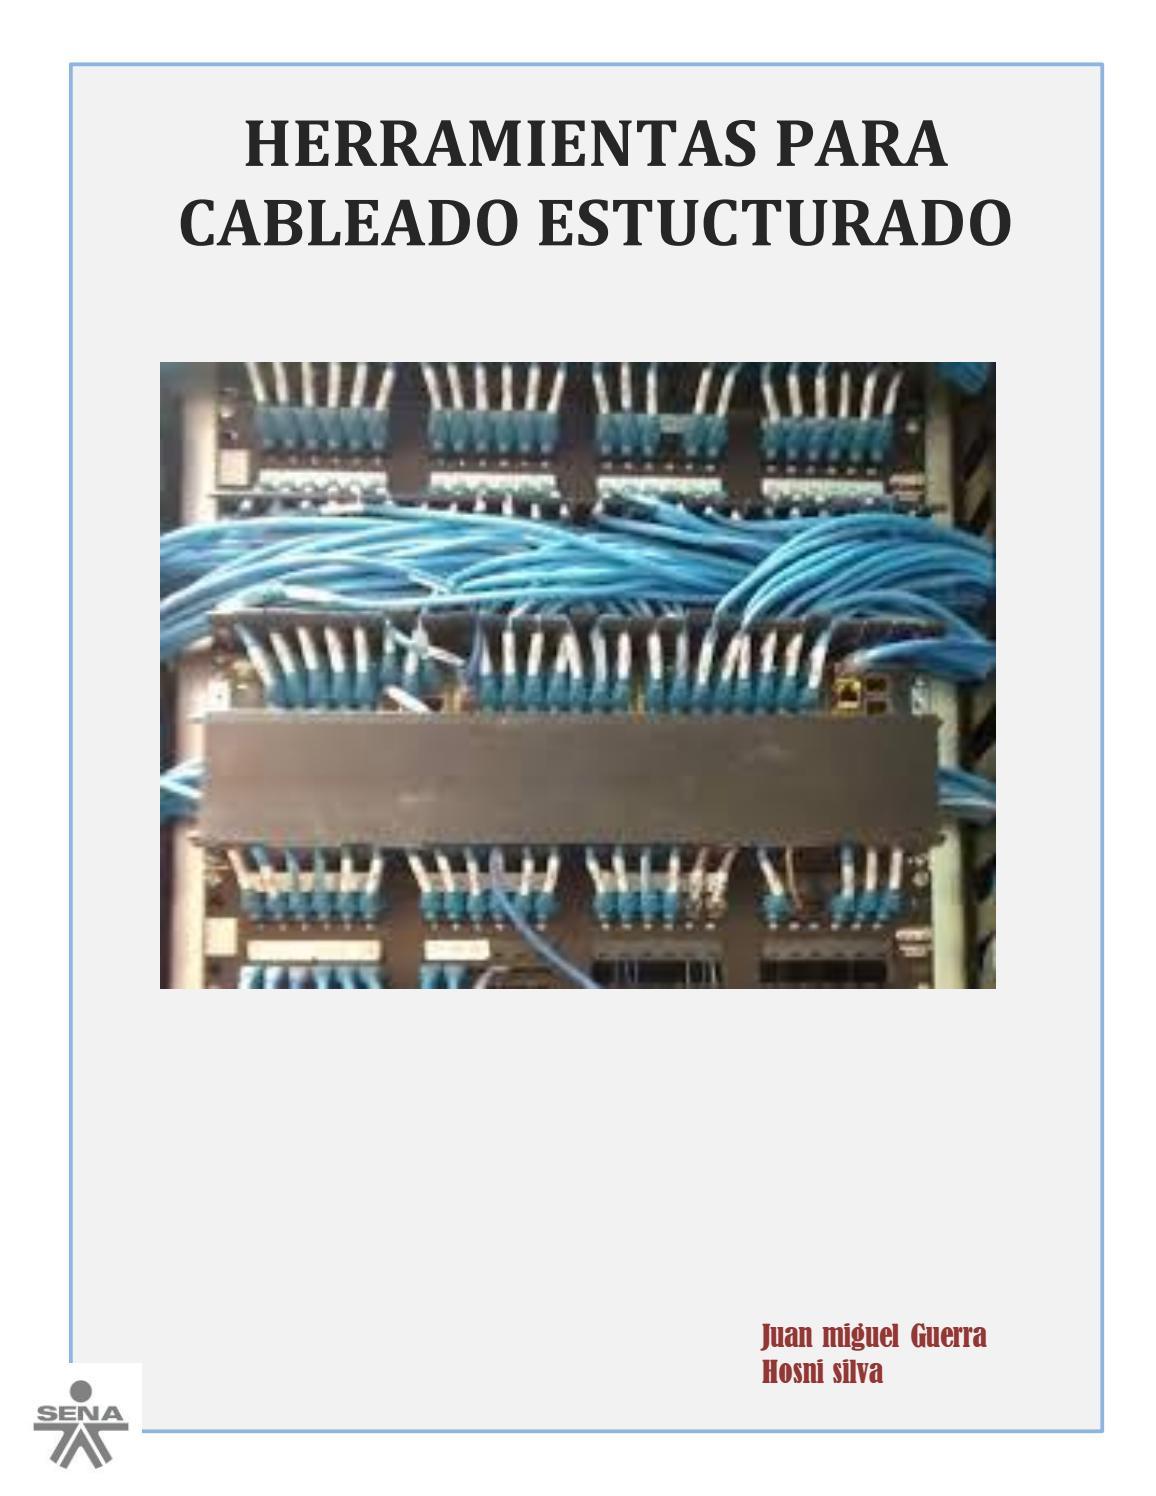 100 bridas 3,6 x 140 poliamida negro UV estable cable aunar cable cinta